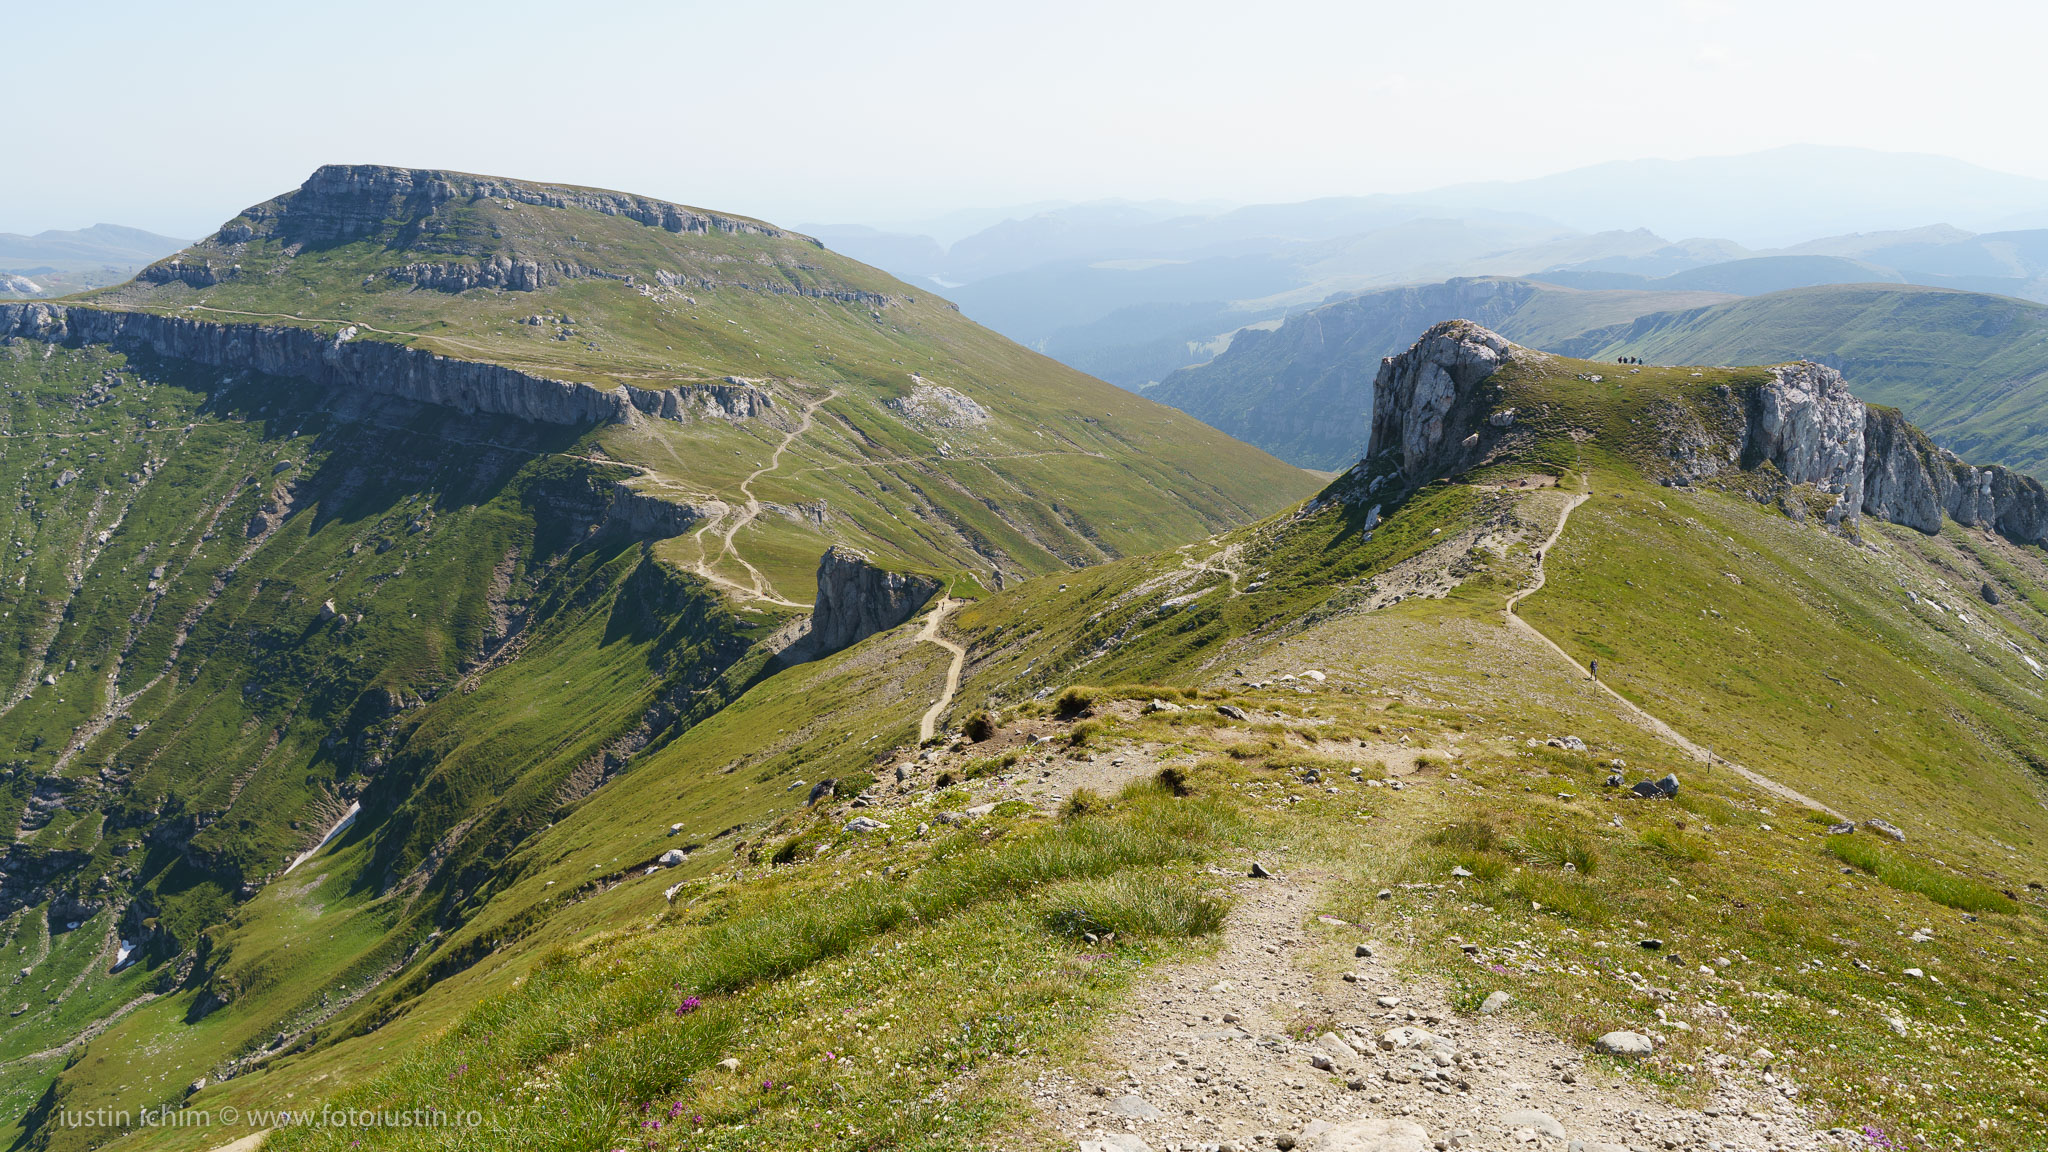 Munții Bucegi, Vf. Obârșiei, 2405m